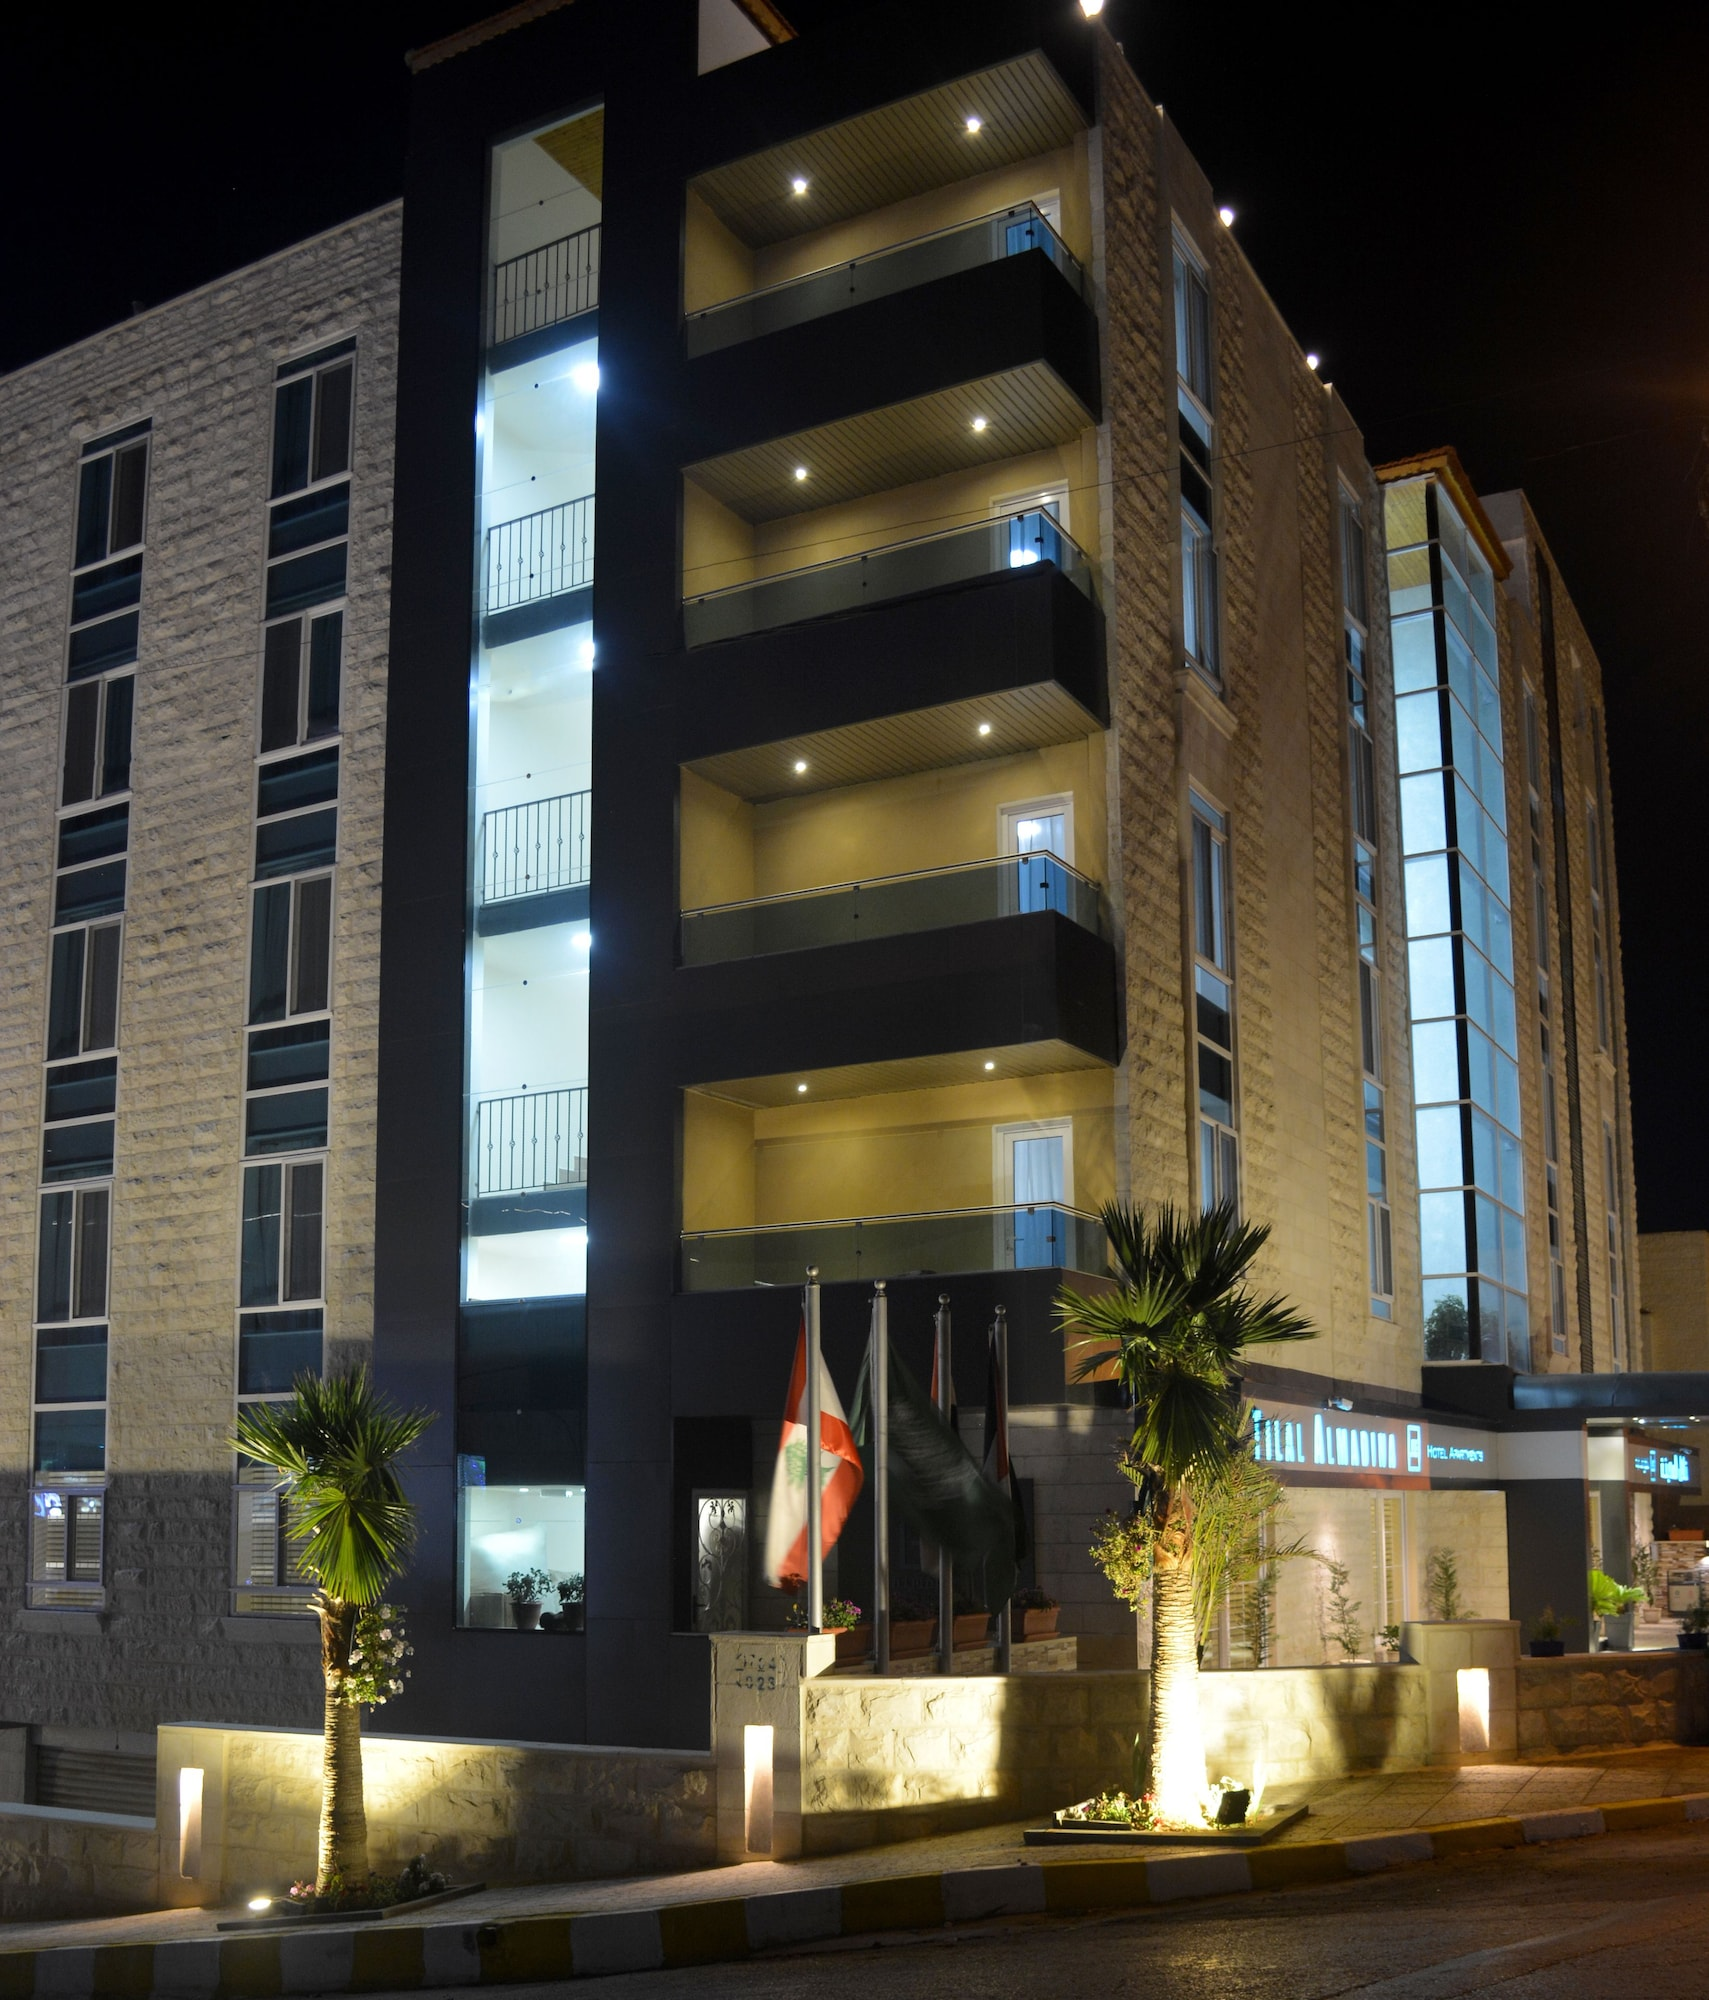 Tilal Almadina Hotel & Suites, Salt